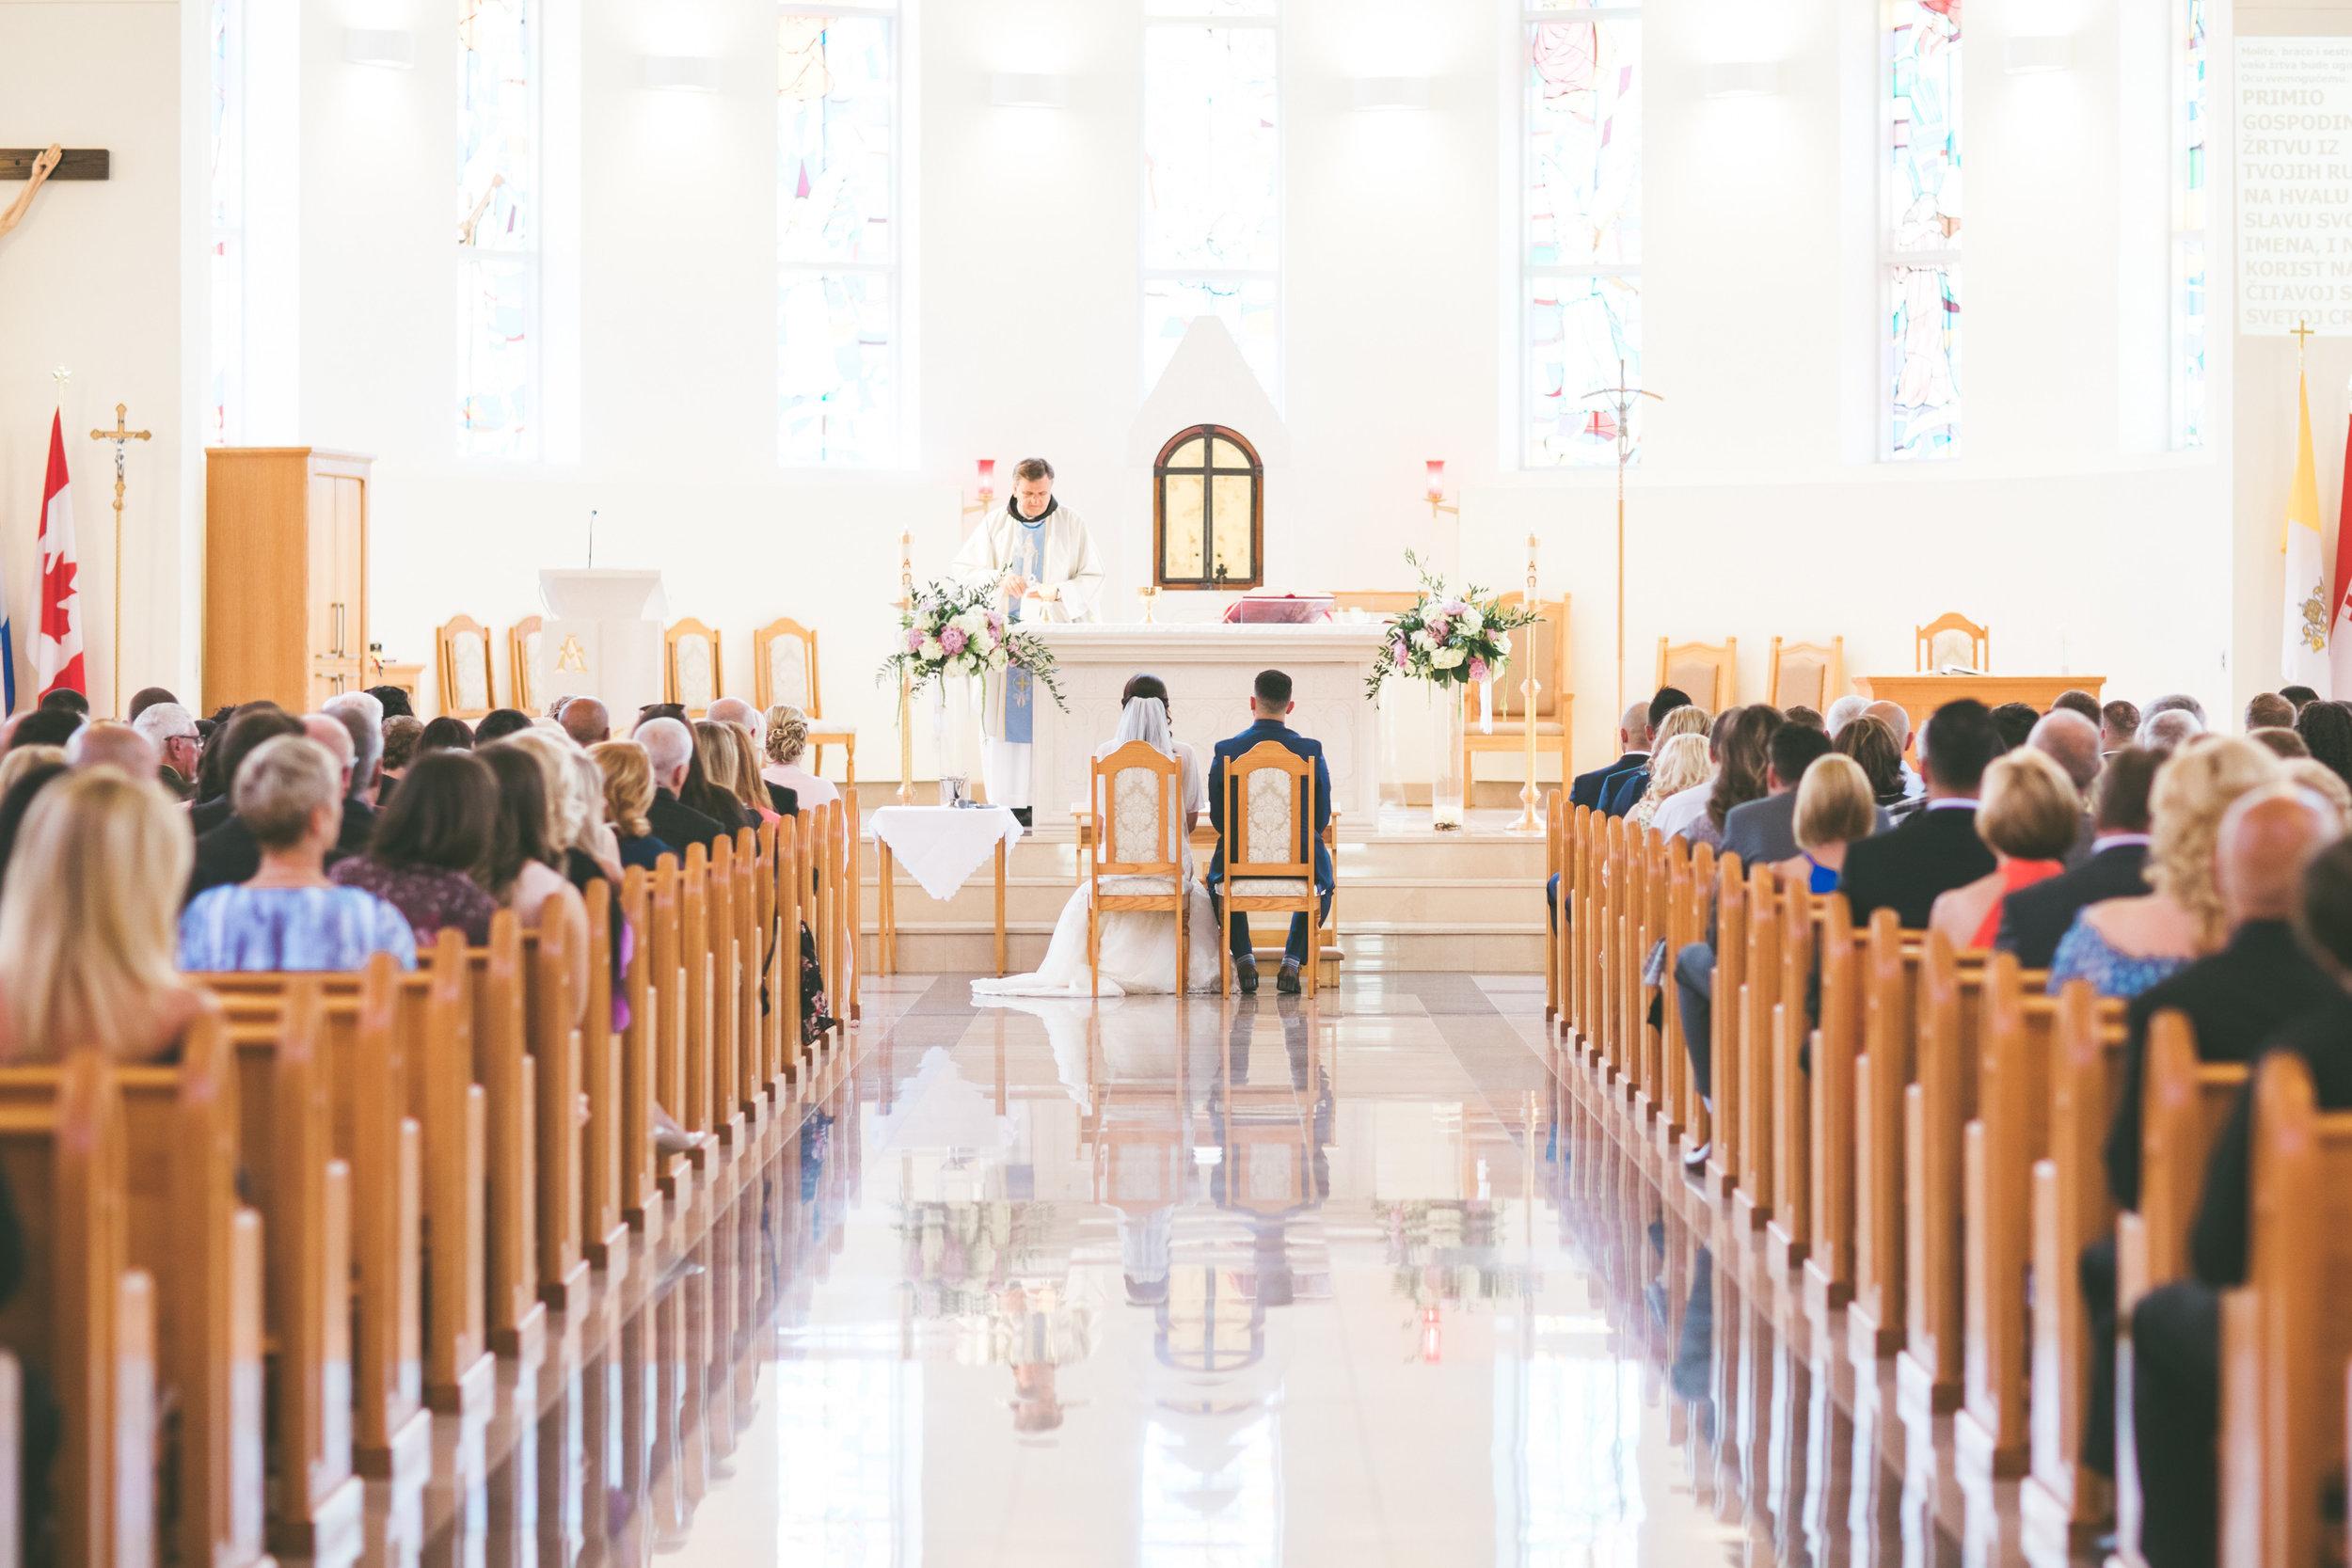 ashley___dario_wedding___lifesreel_danielcaruso___0824.jpg